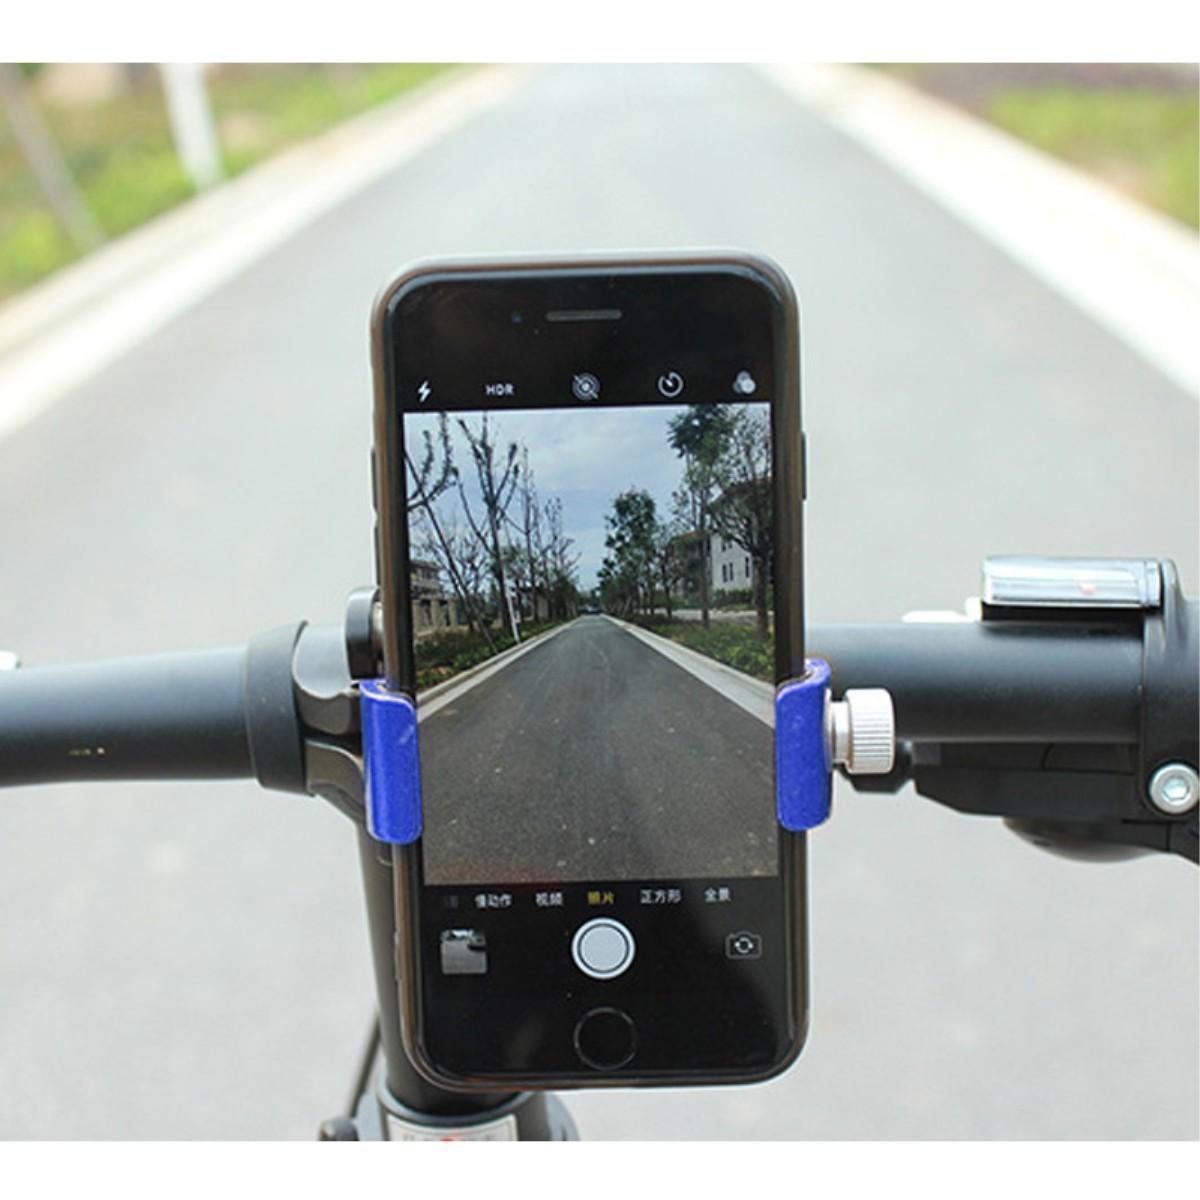 Купить с кэшбэком DUUTI 3-7inch Aluminium Alloy Mount Bracket  Bike Adjustable Phone GPS Mount Holder Anti-Slip for Motorcycle Bicycle Accessories